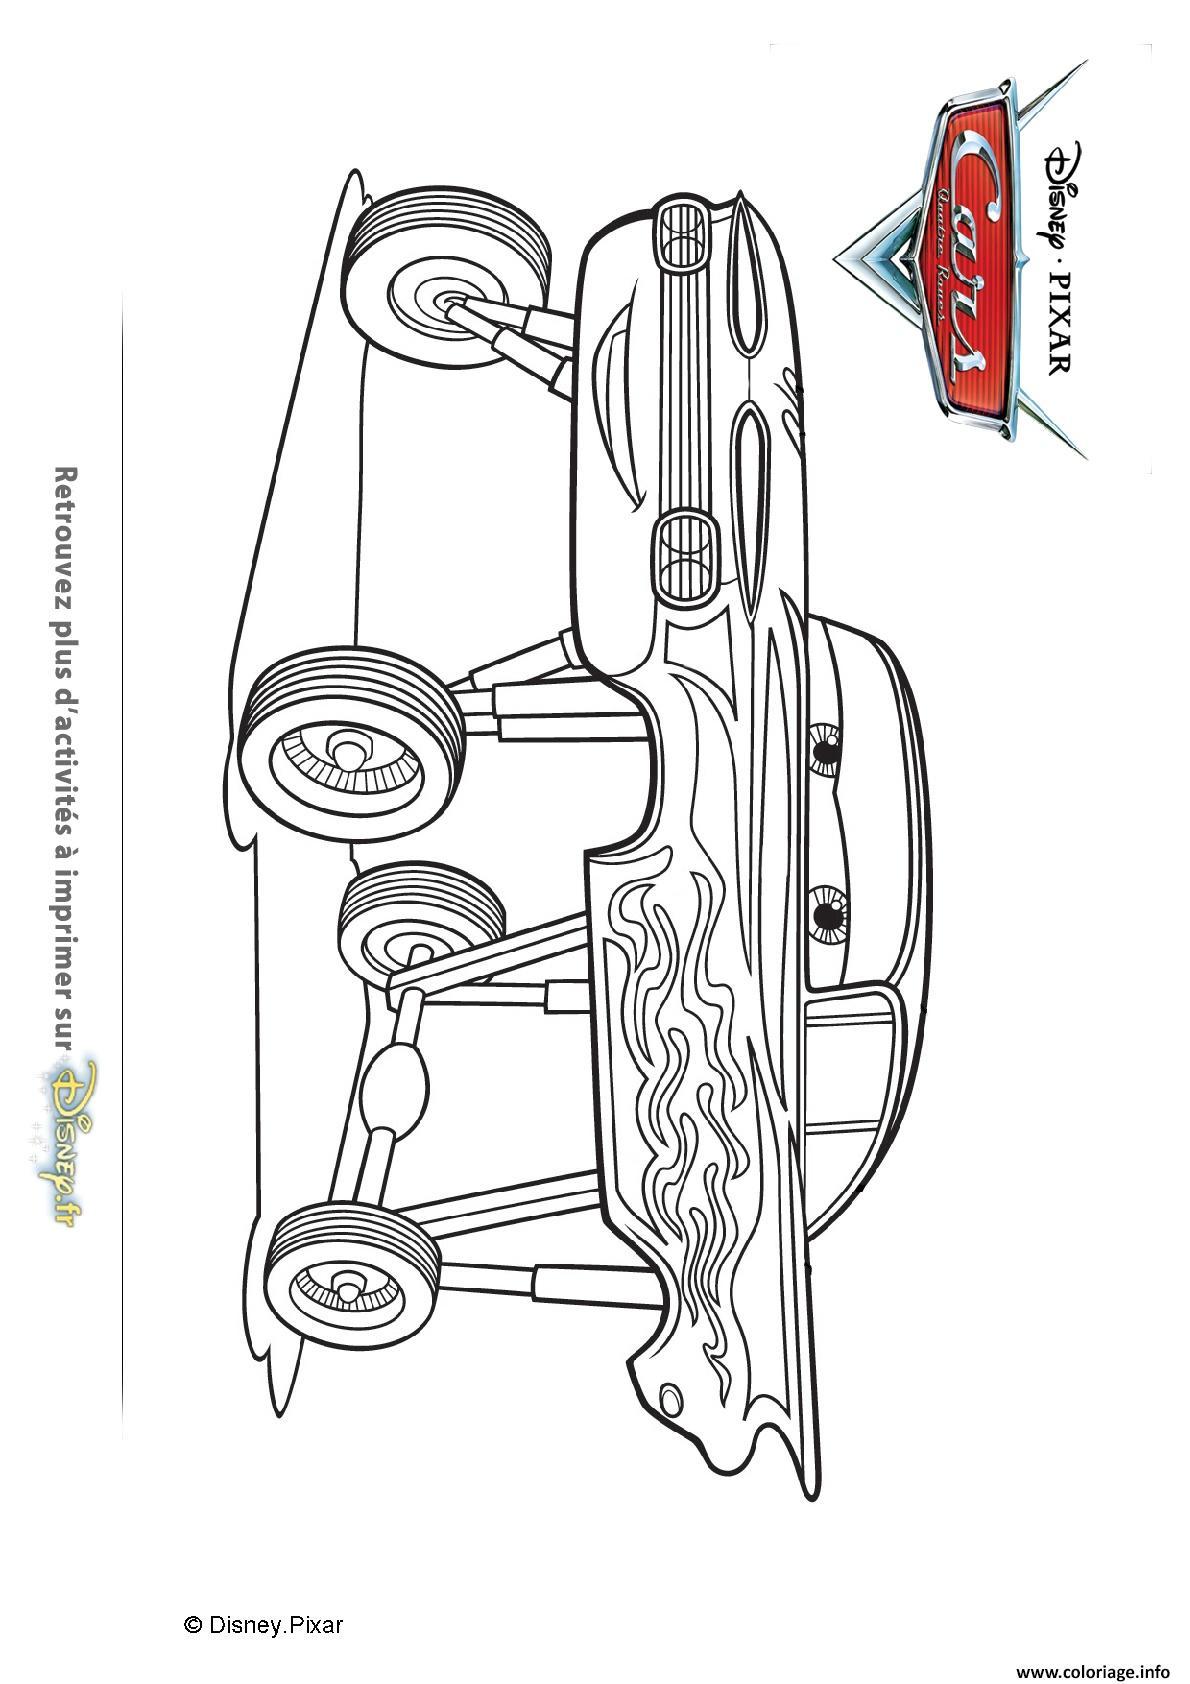 Coloriage ramone et ses roues cars disney dessin - Coloriage cars jpg ...